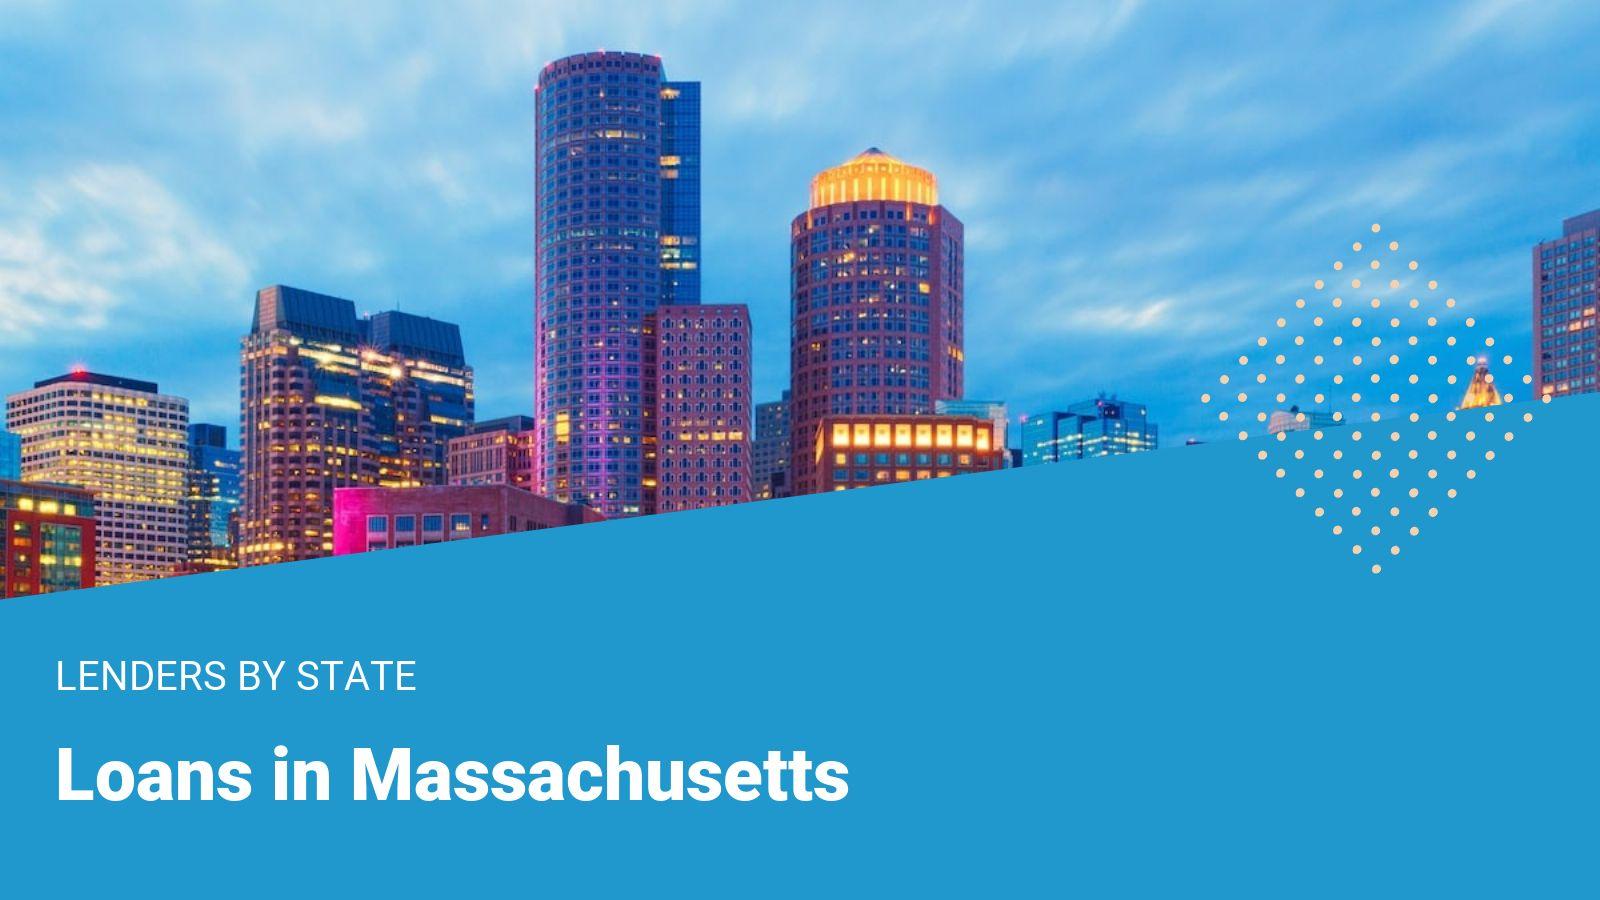 Massachusetts loans